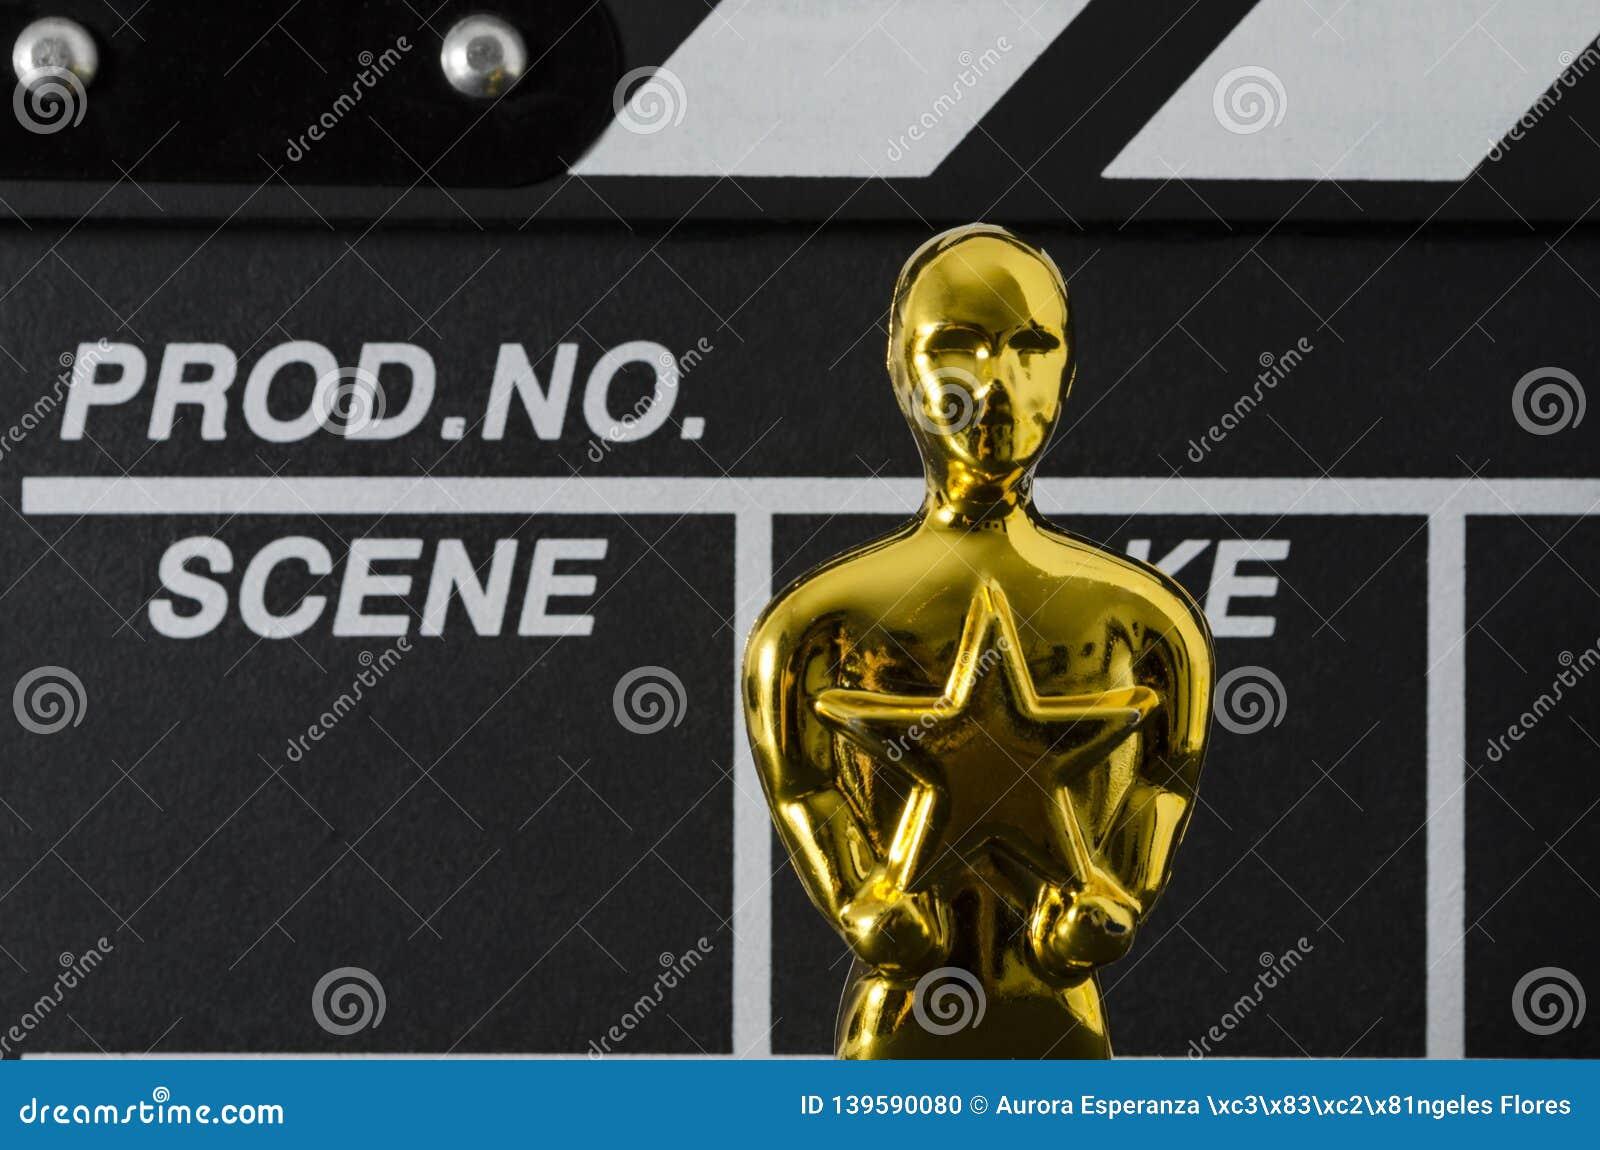 Plastic Oscar award and clapboard